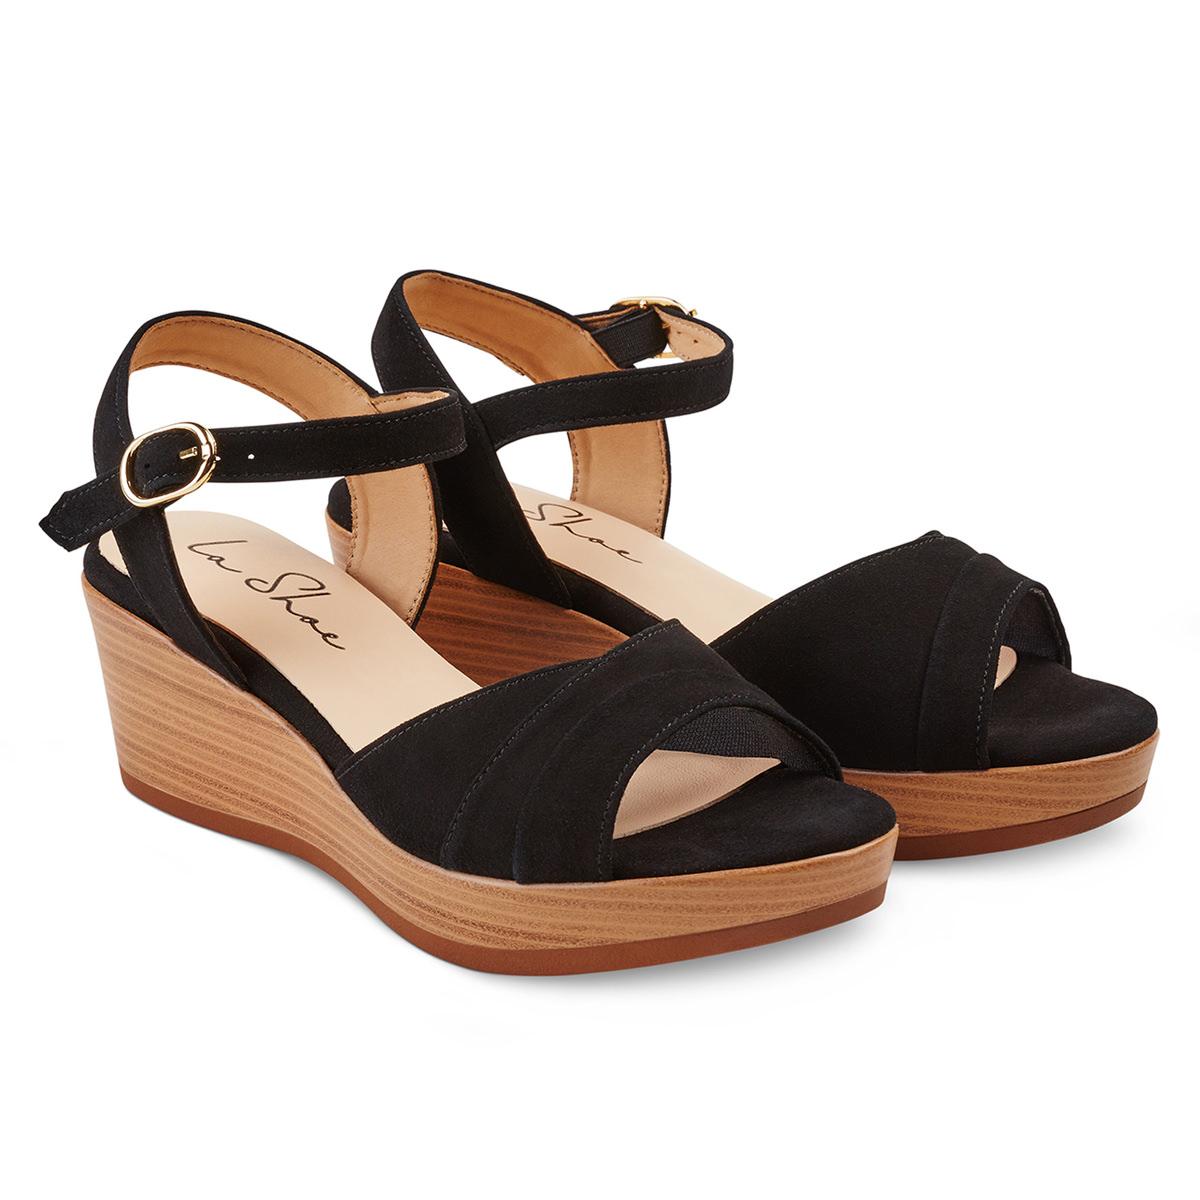 Schwarz Sandale Keilabsatz Auf Keilabsatz Sandale Auf Keilabsatz Sandale Auf Schwarz UMqGLVpSz